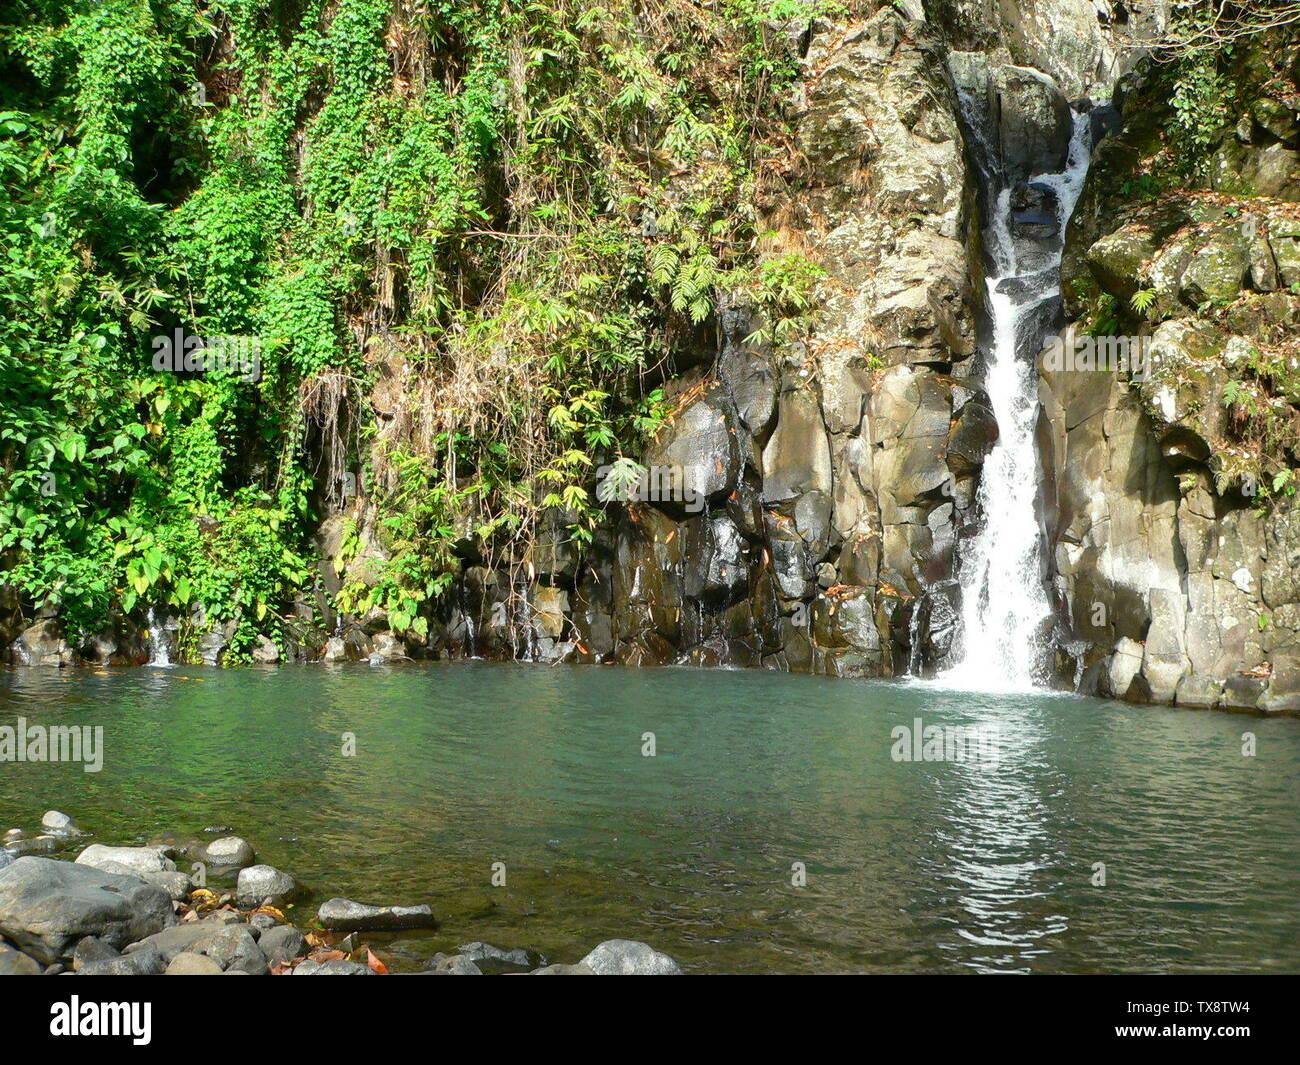 Tagalog Stock Photos & Tagalog Stock Images - Alamy